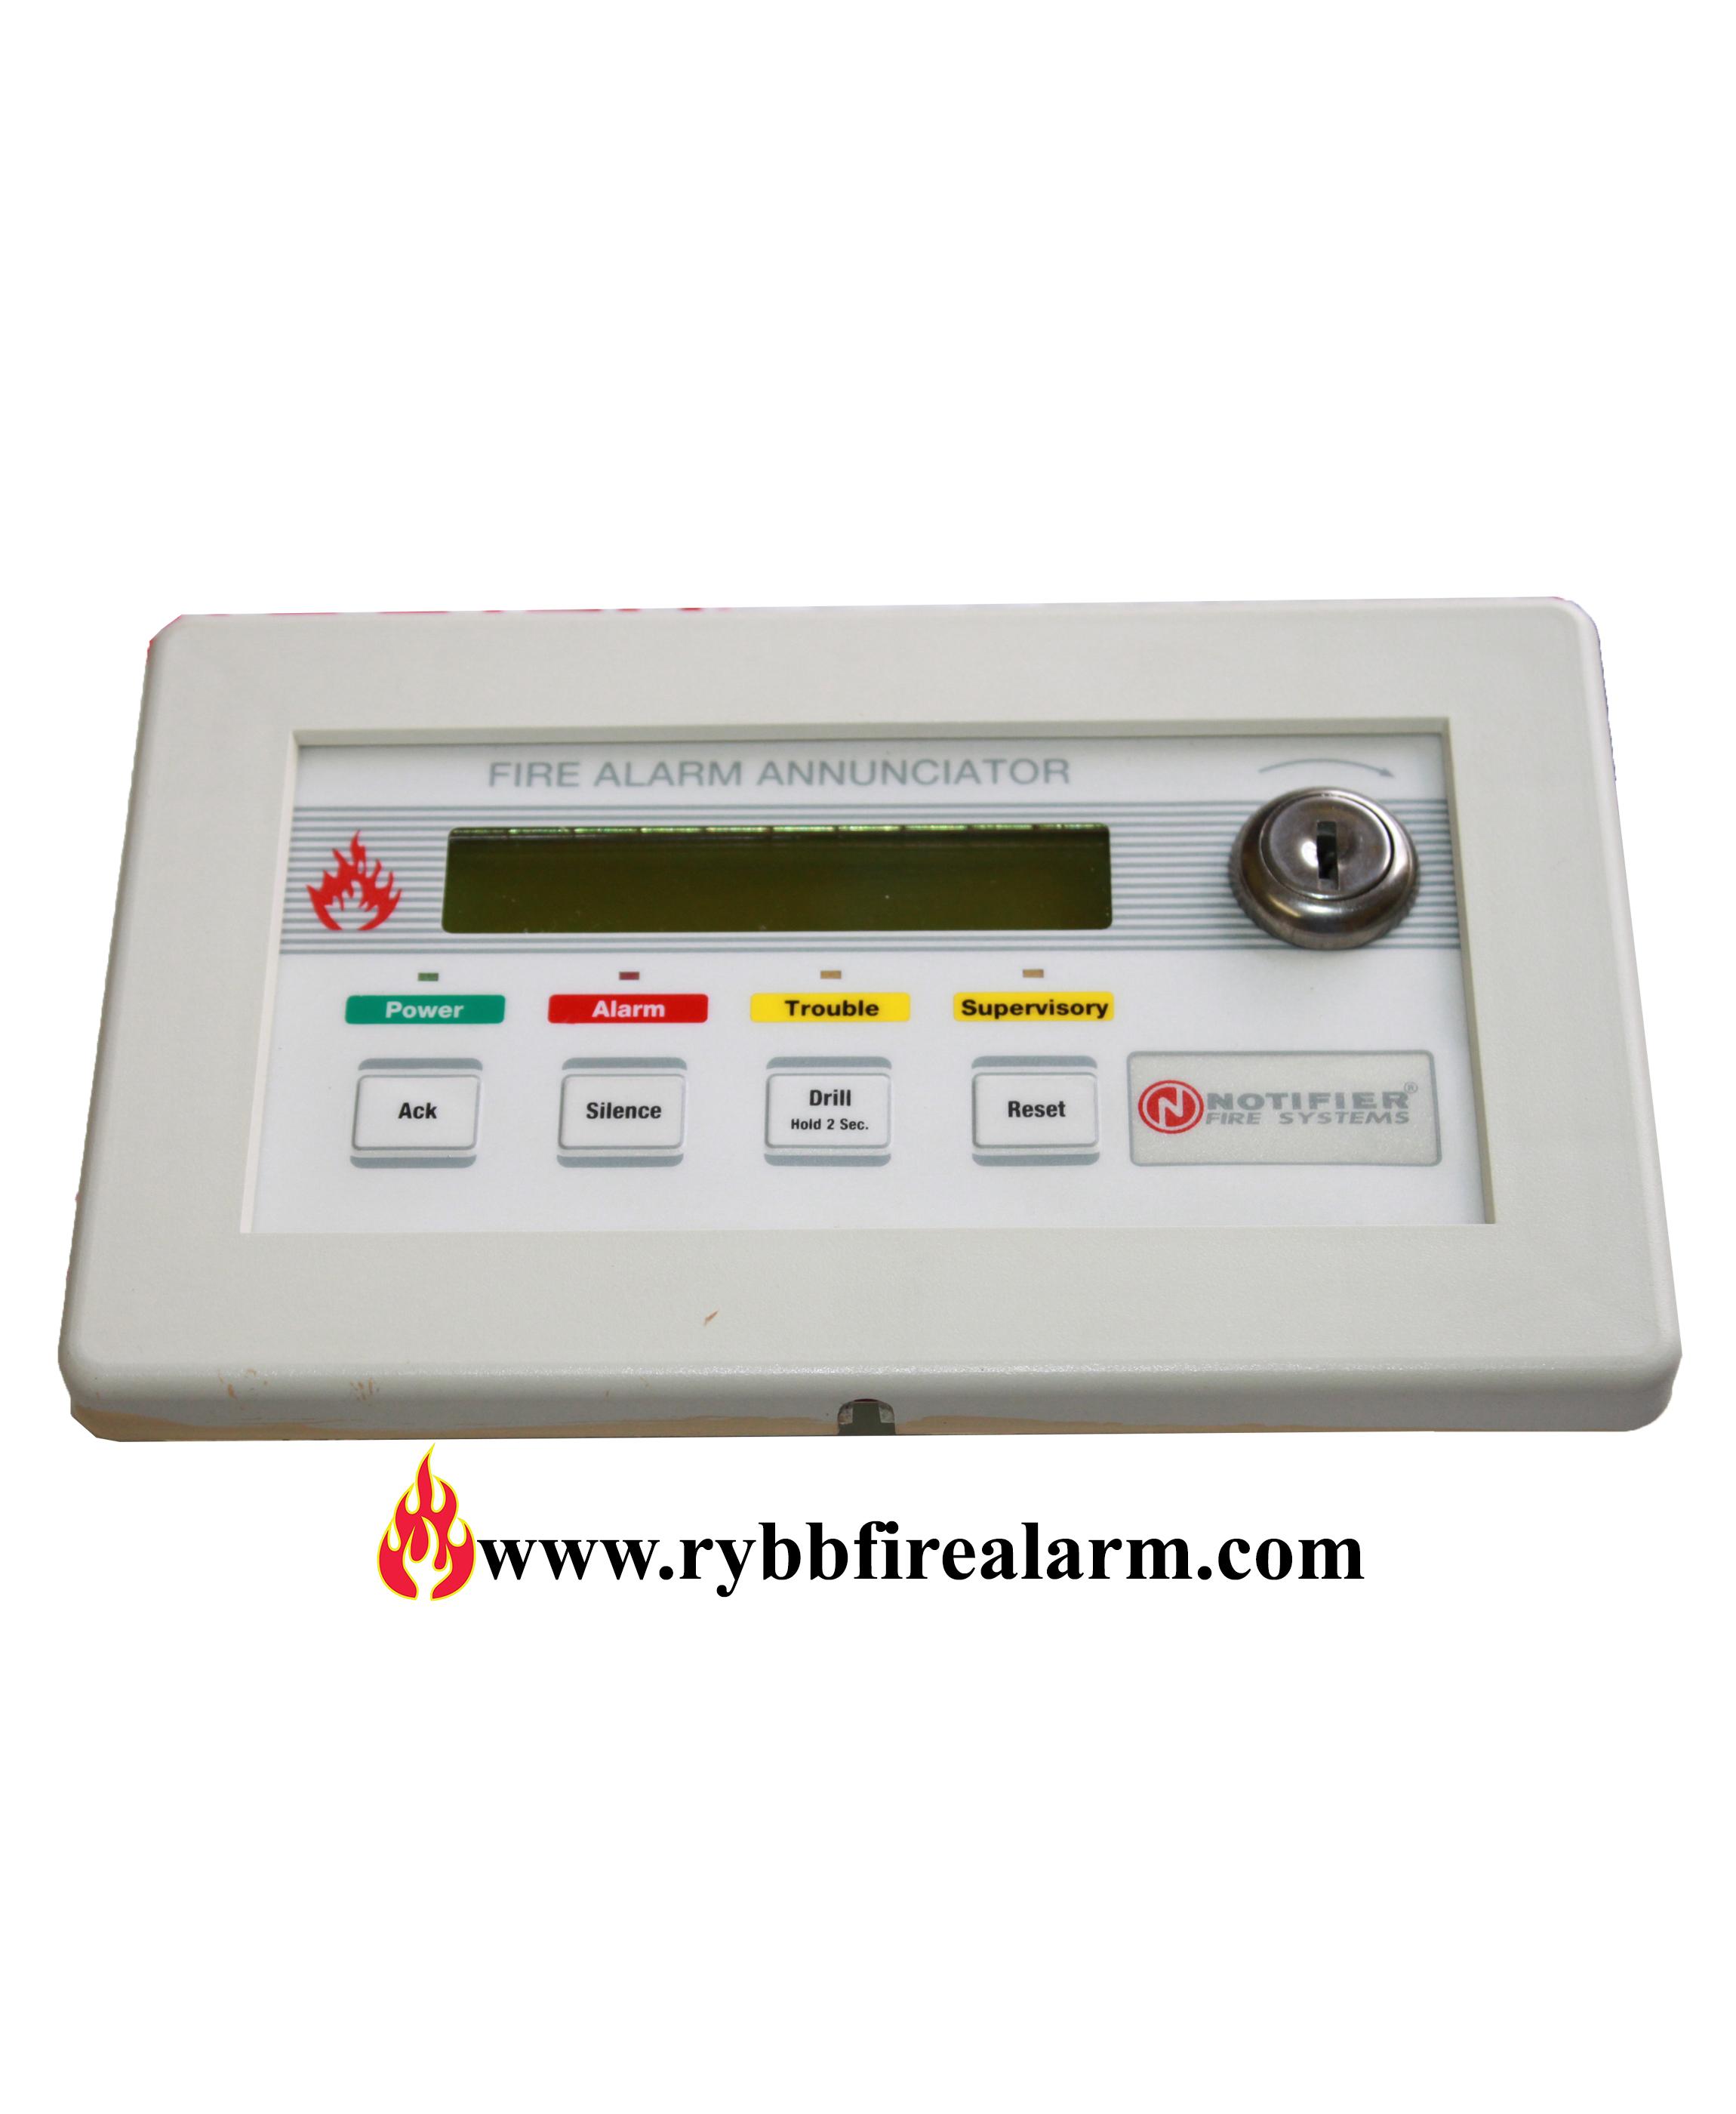 Notifier Lcd 2x20 Fire Alarm Annunciator Rybb Fire Alarm